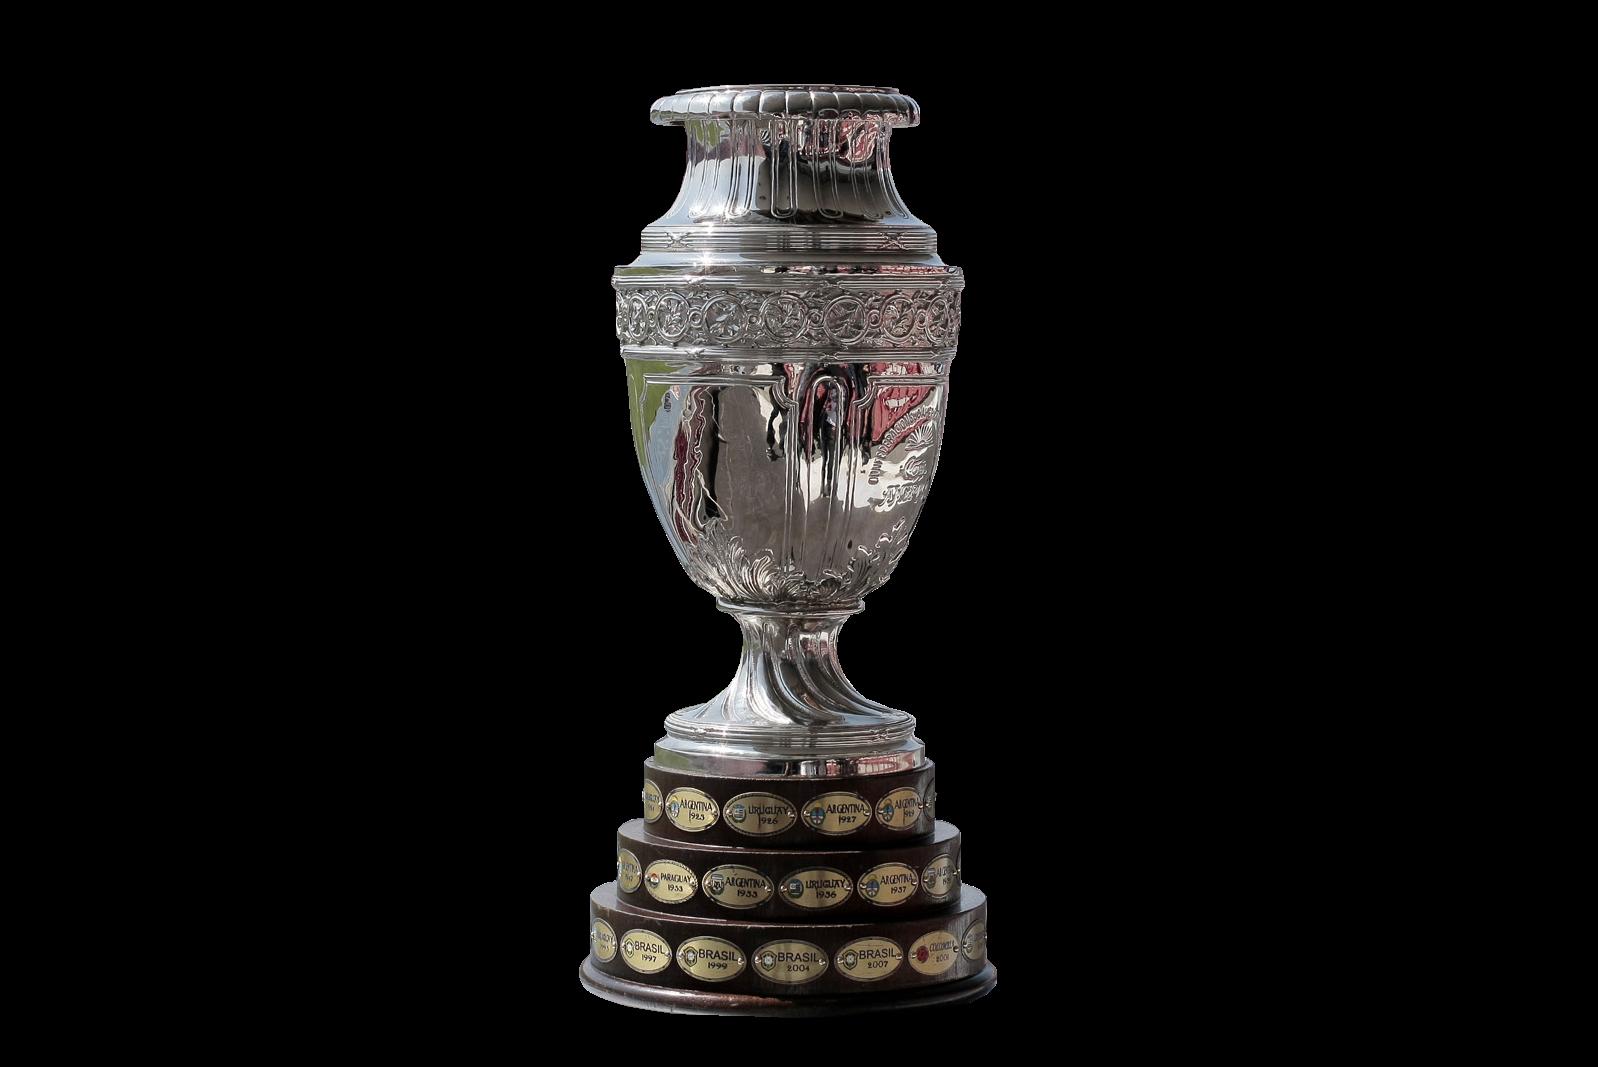 America Copa